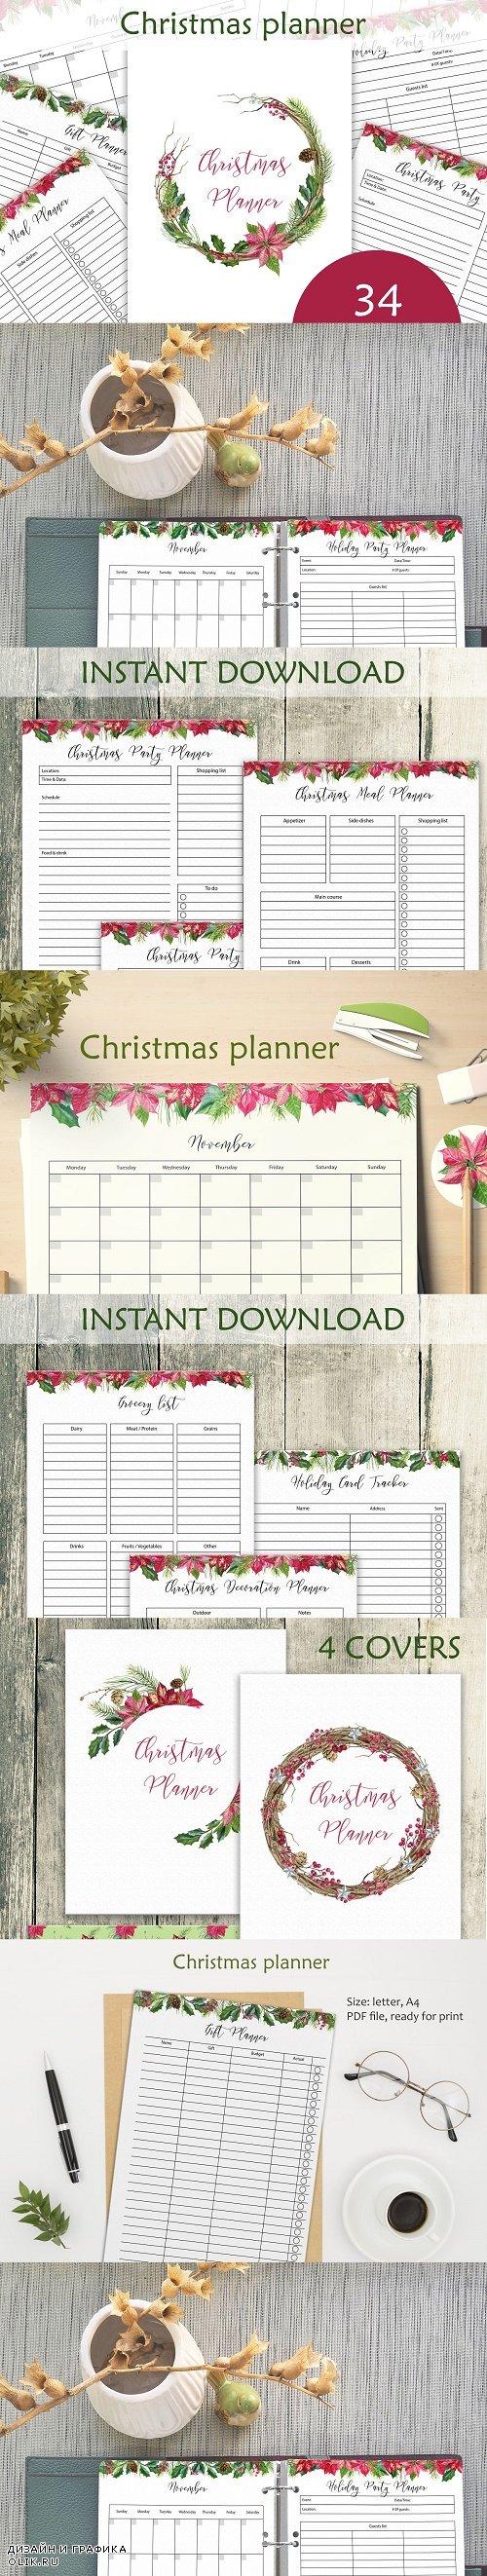 Christmas planner Letter size PDF - 4246032